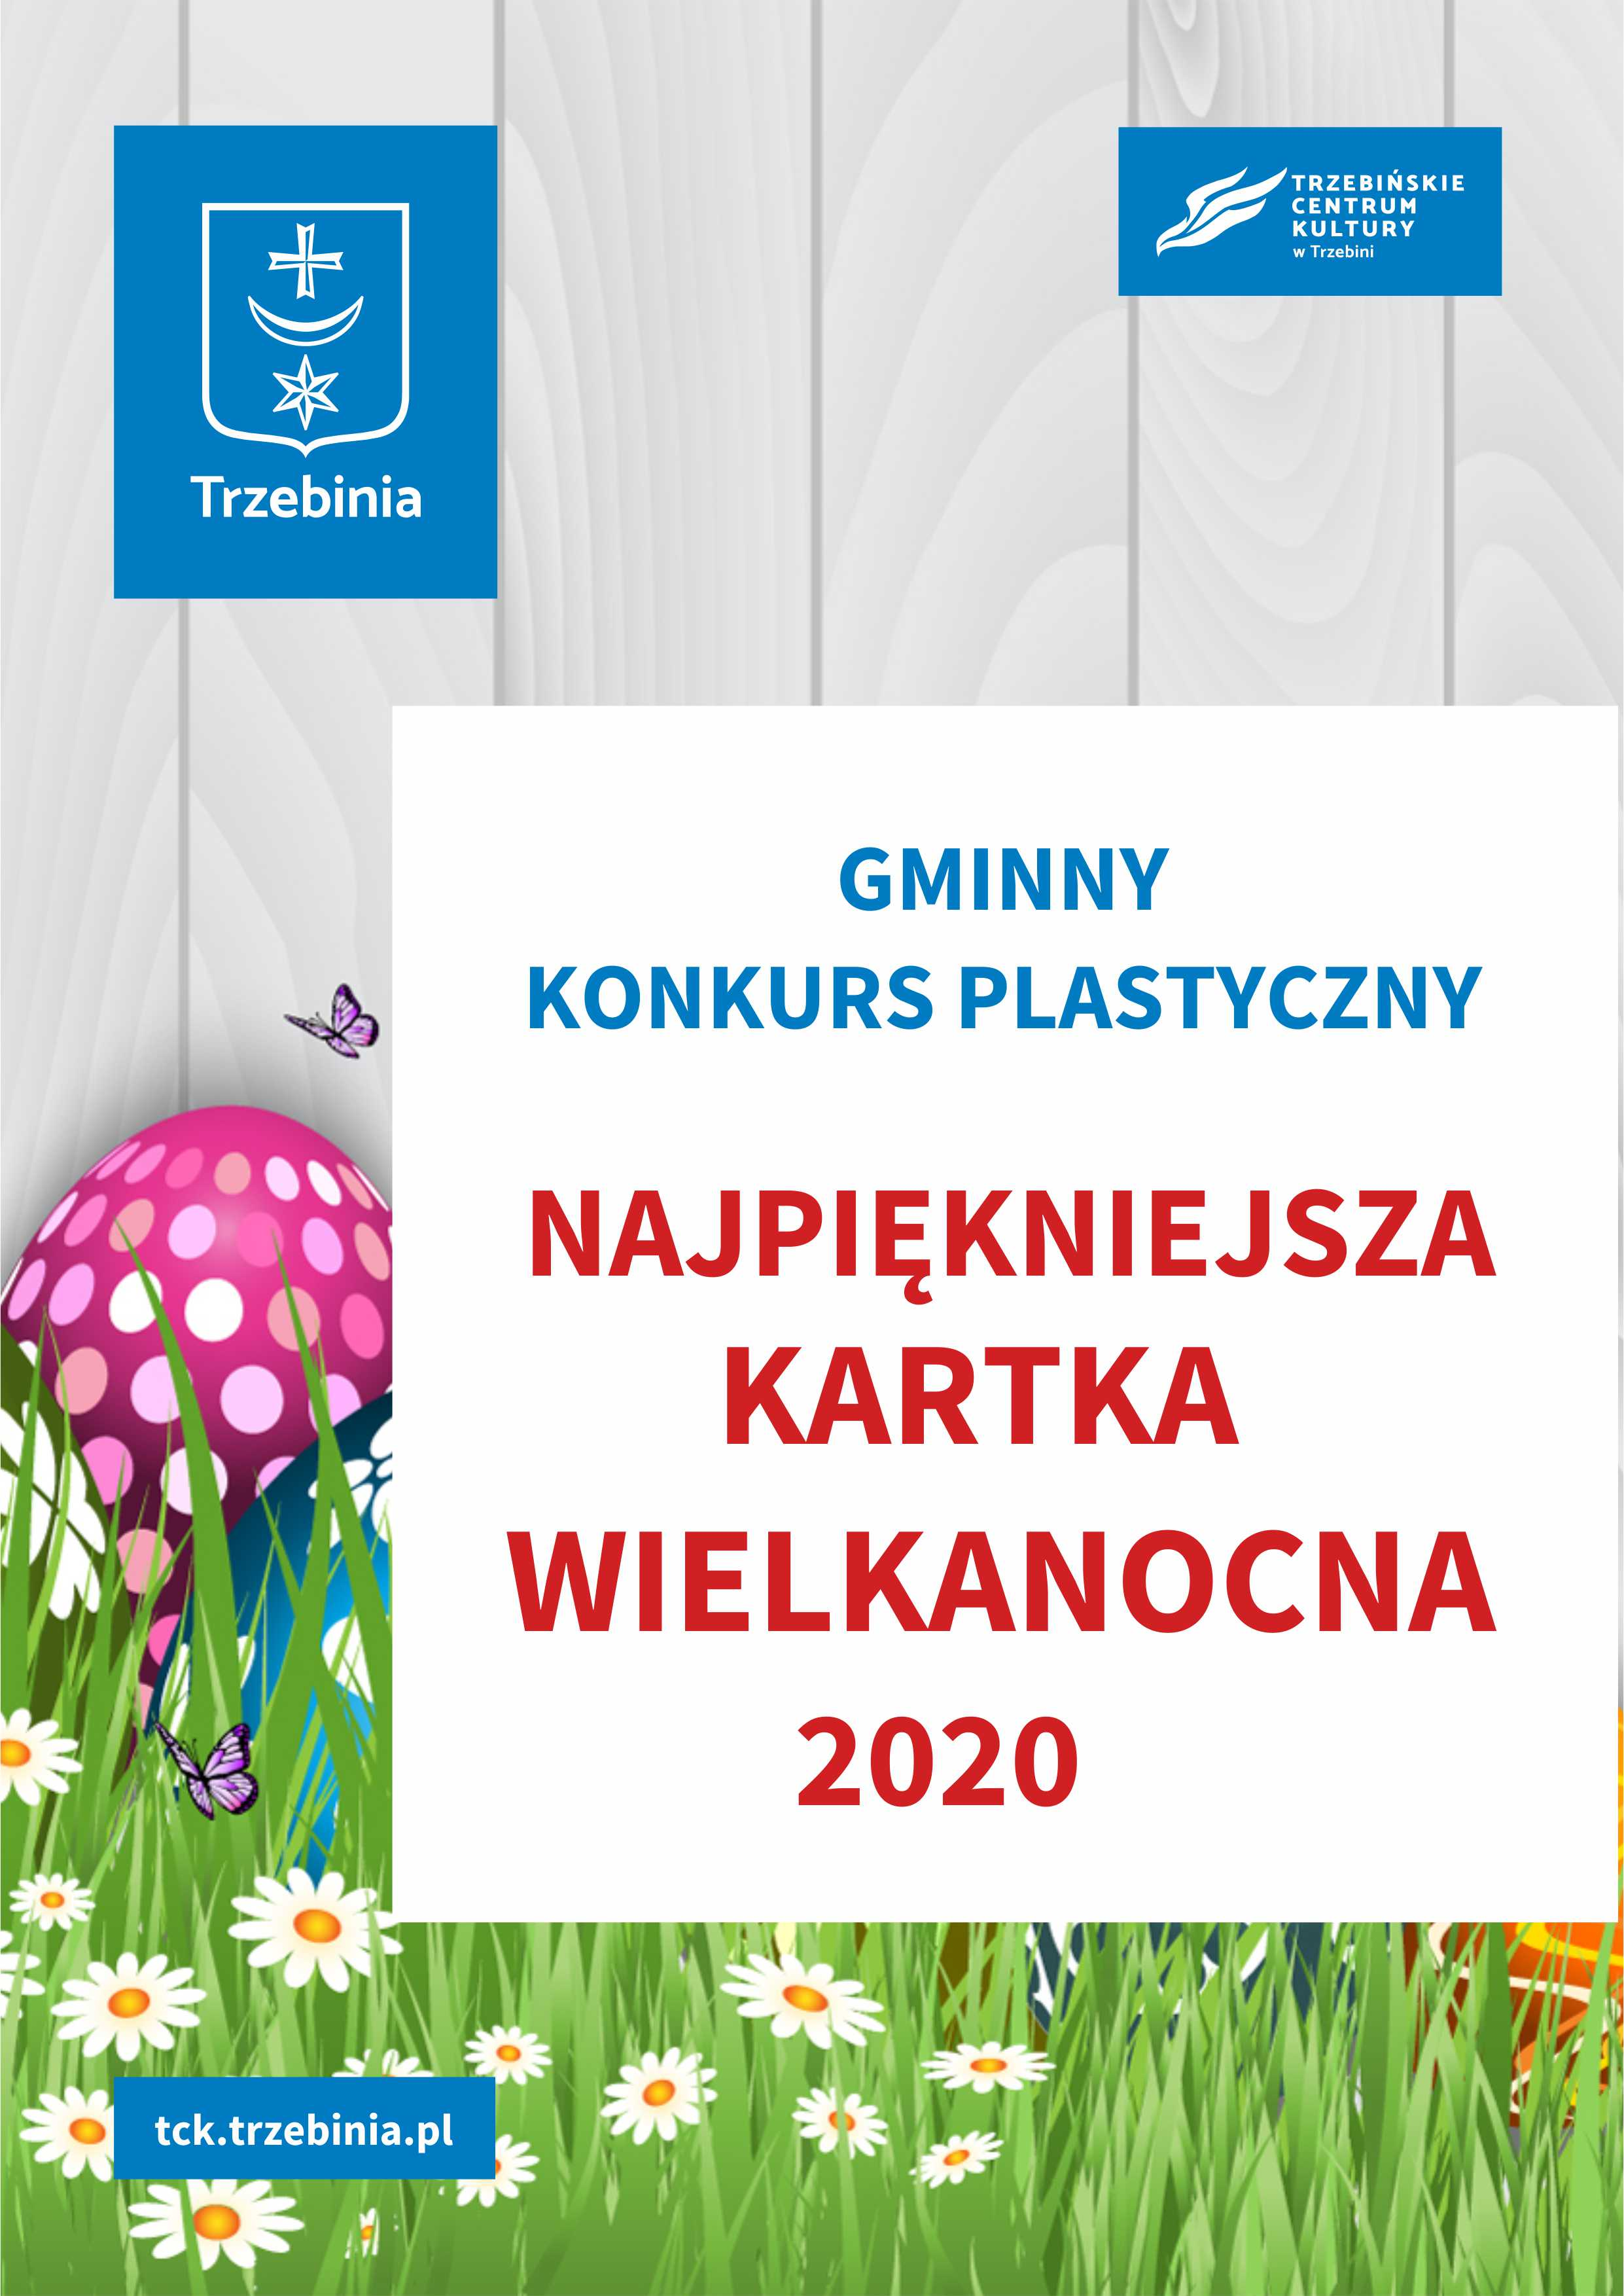 kartka wielkanocna 2020